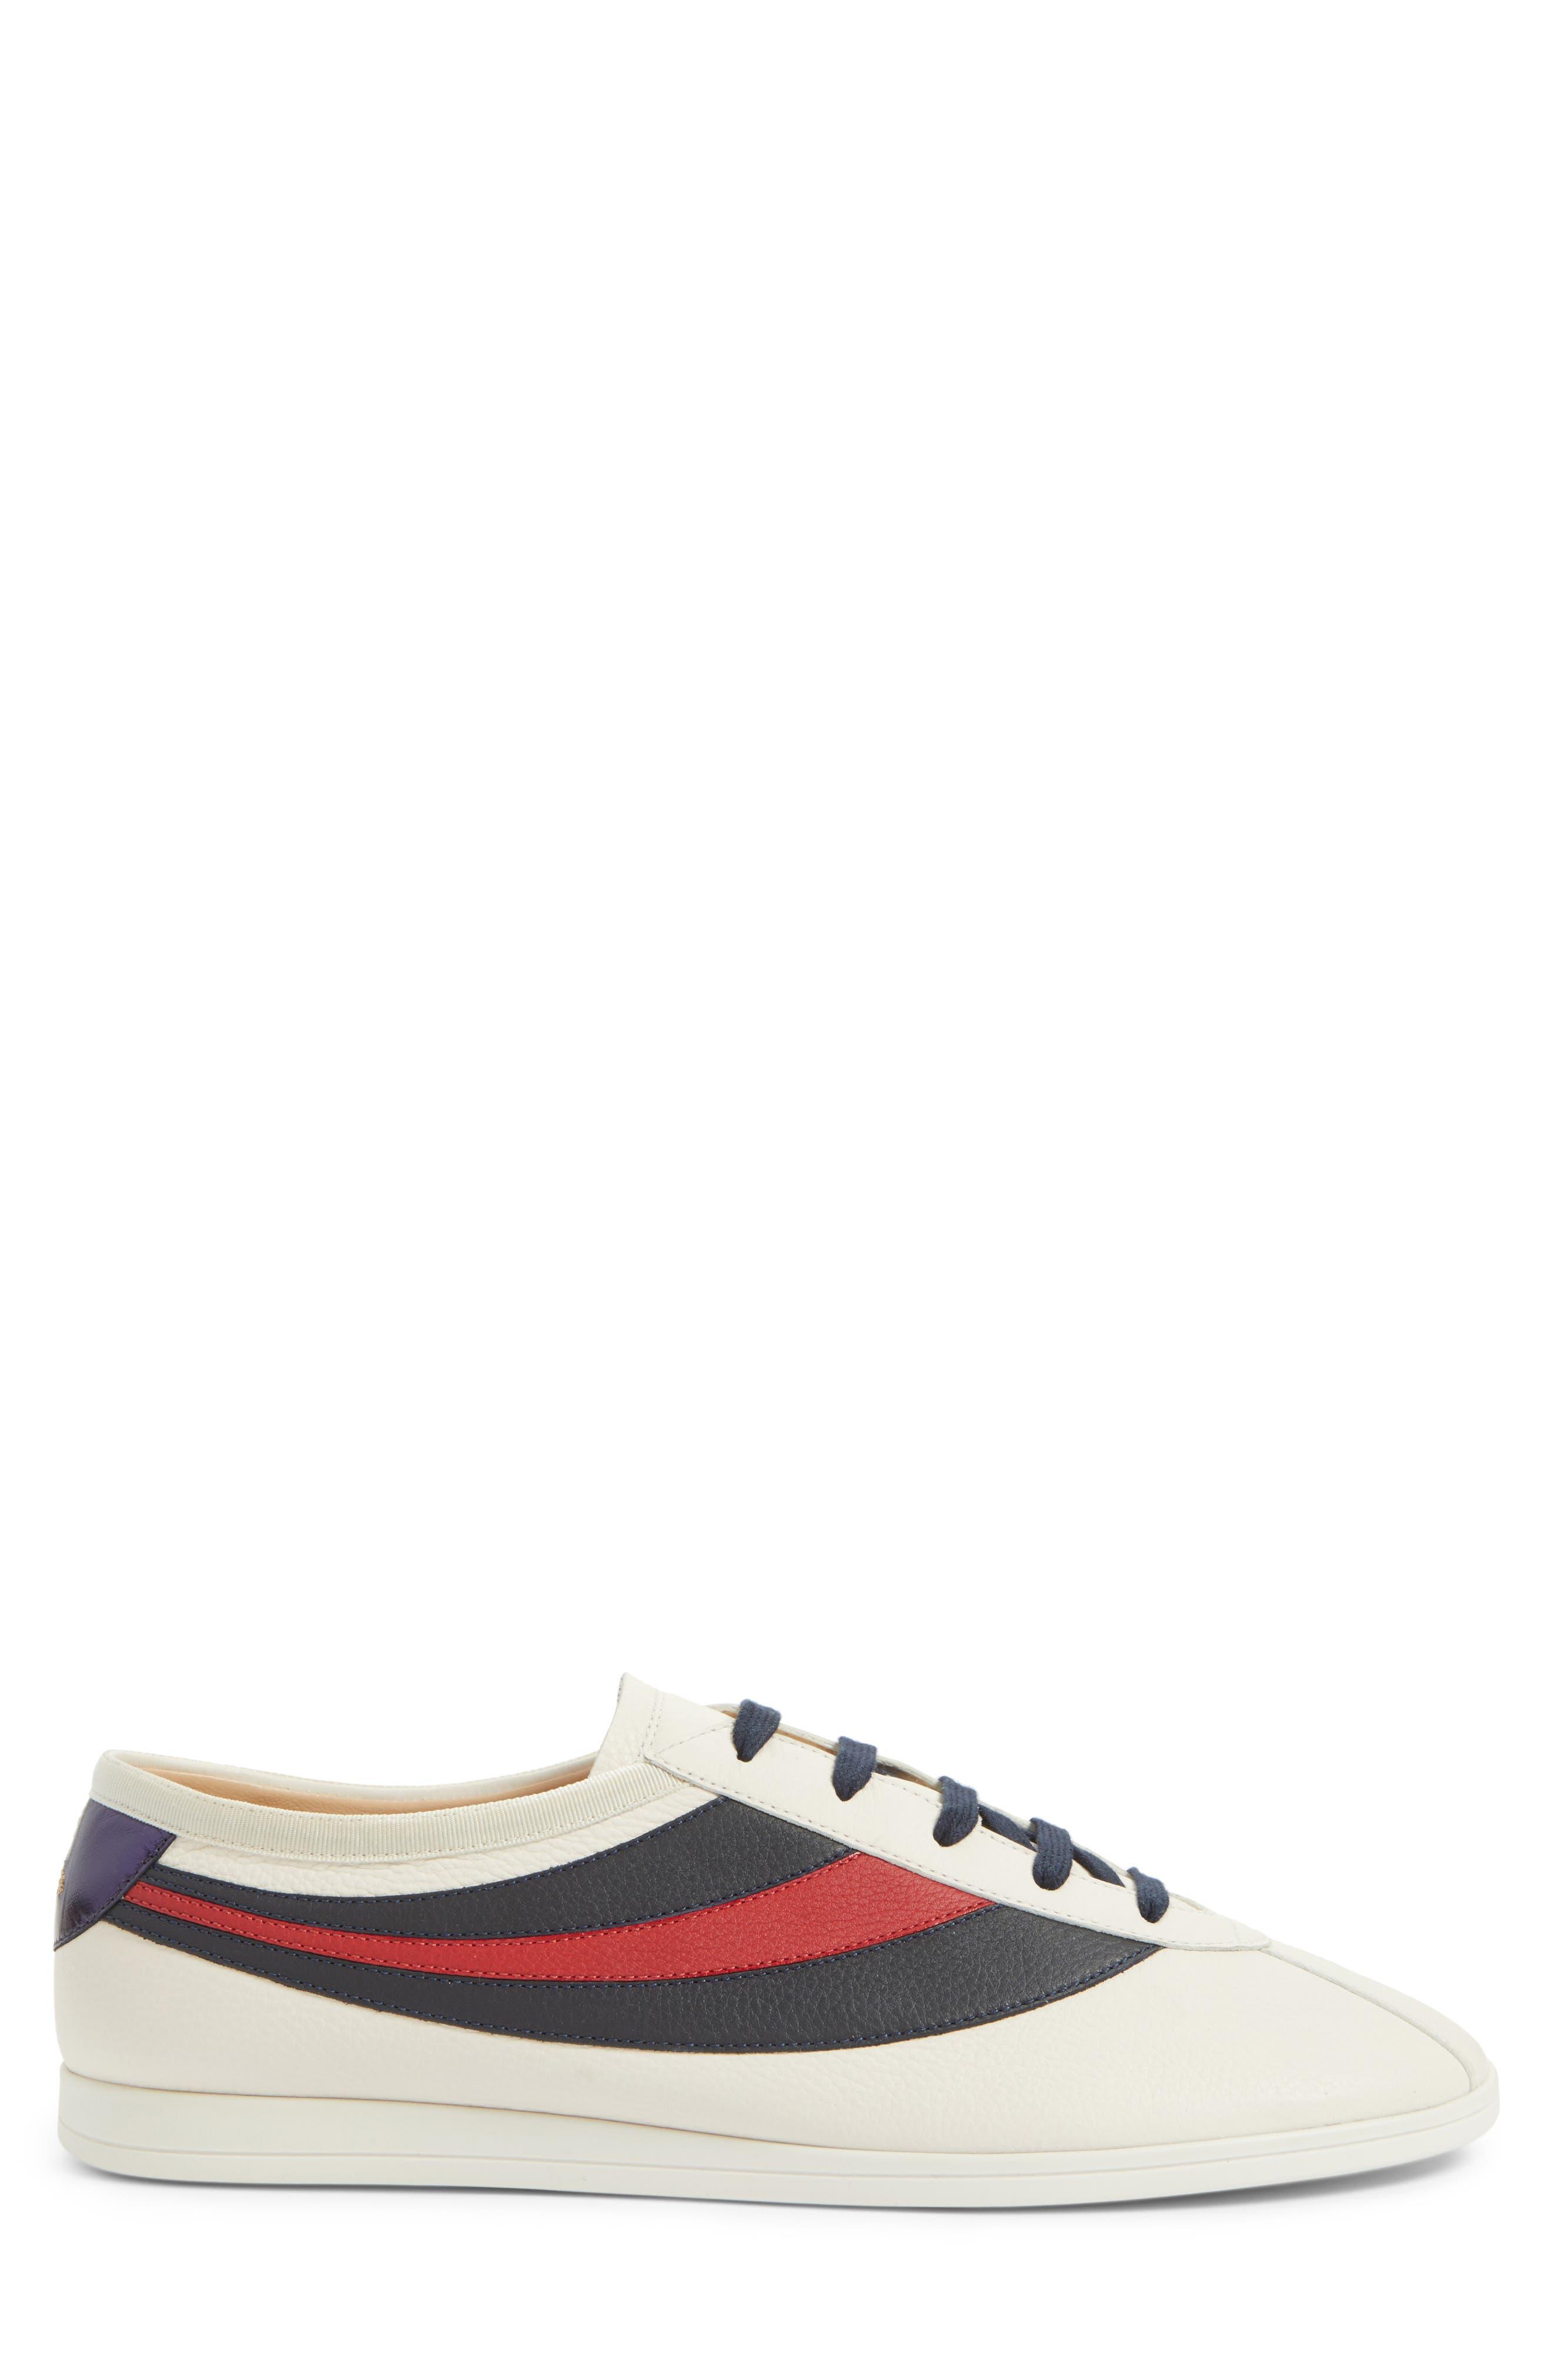 Falacer Sneaker,                             Alternate thumbnail 3, color,                             White